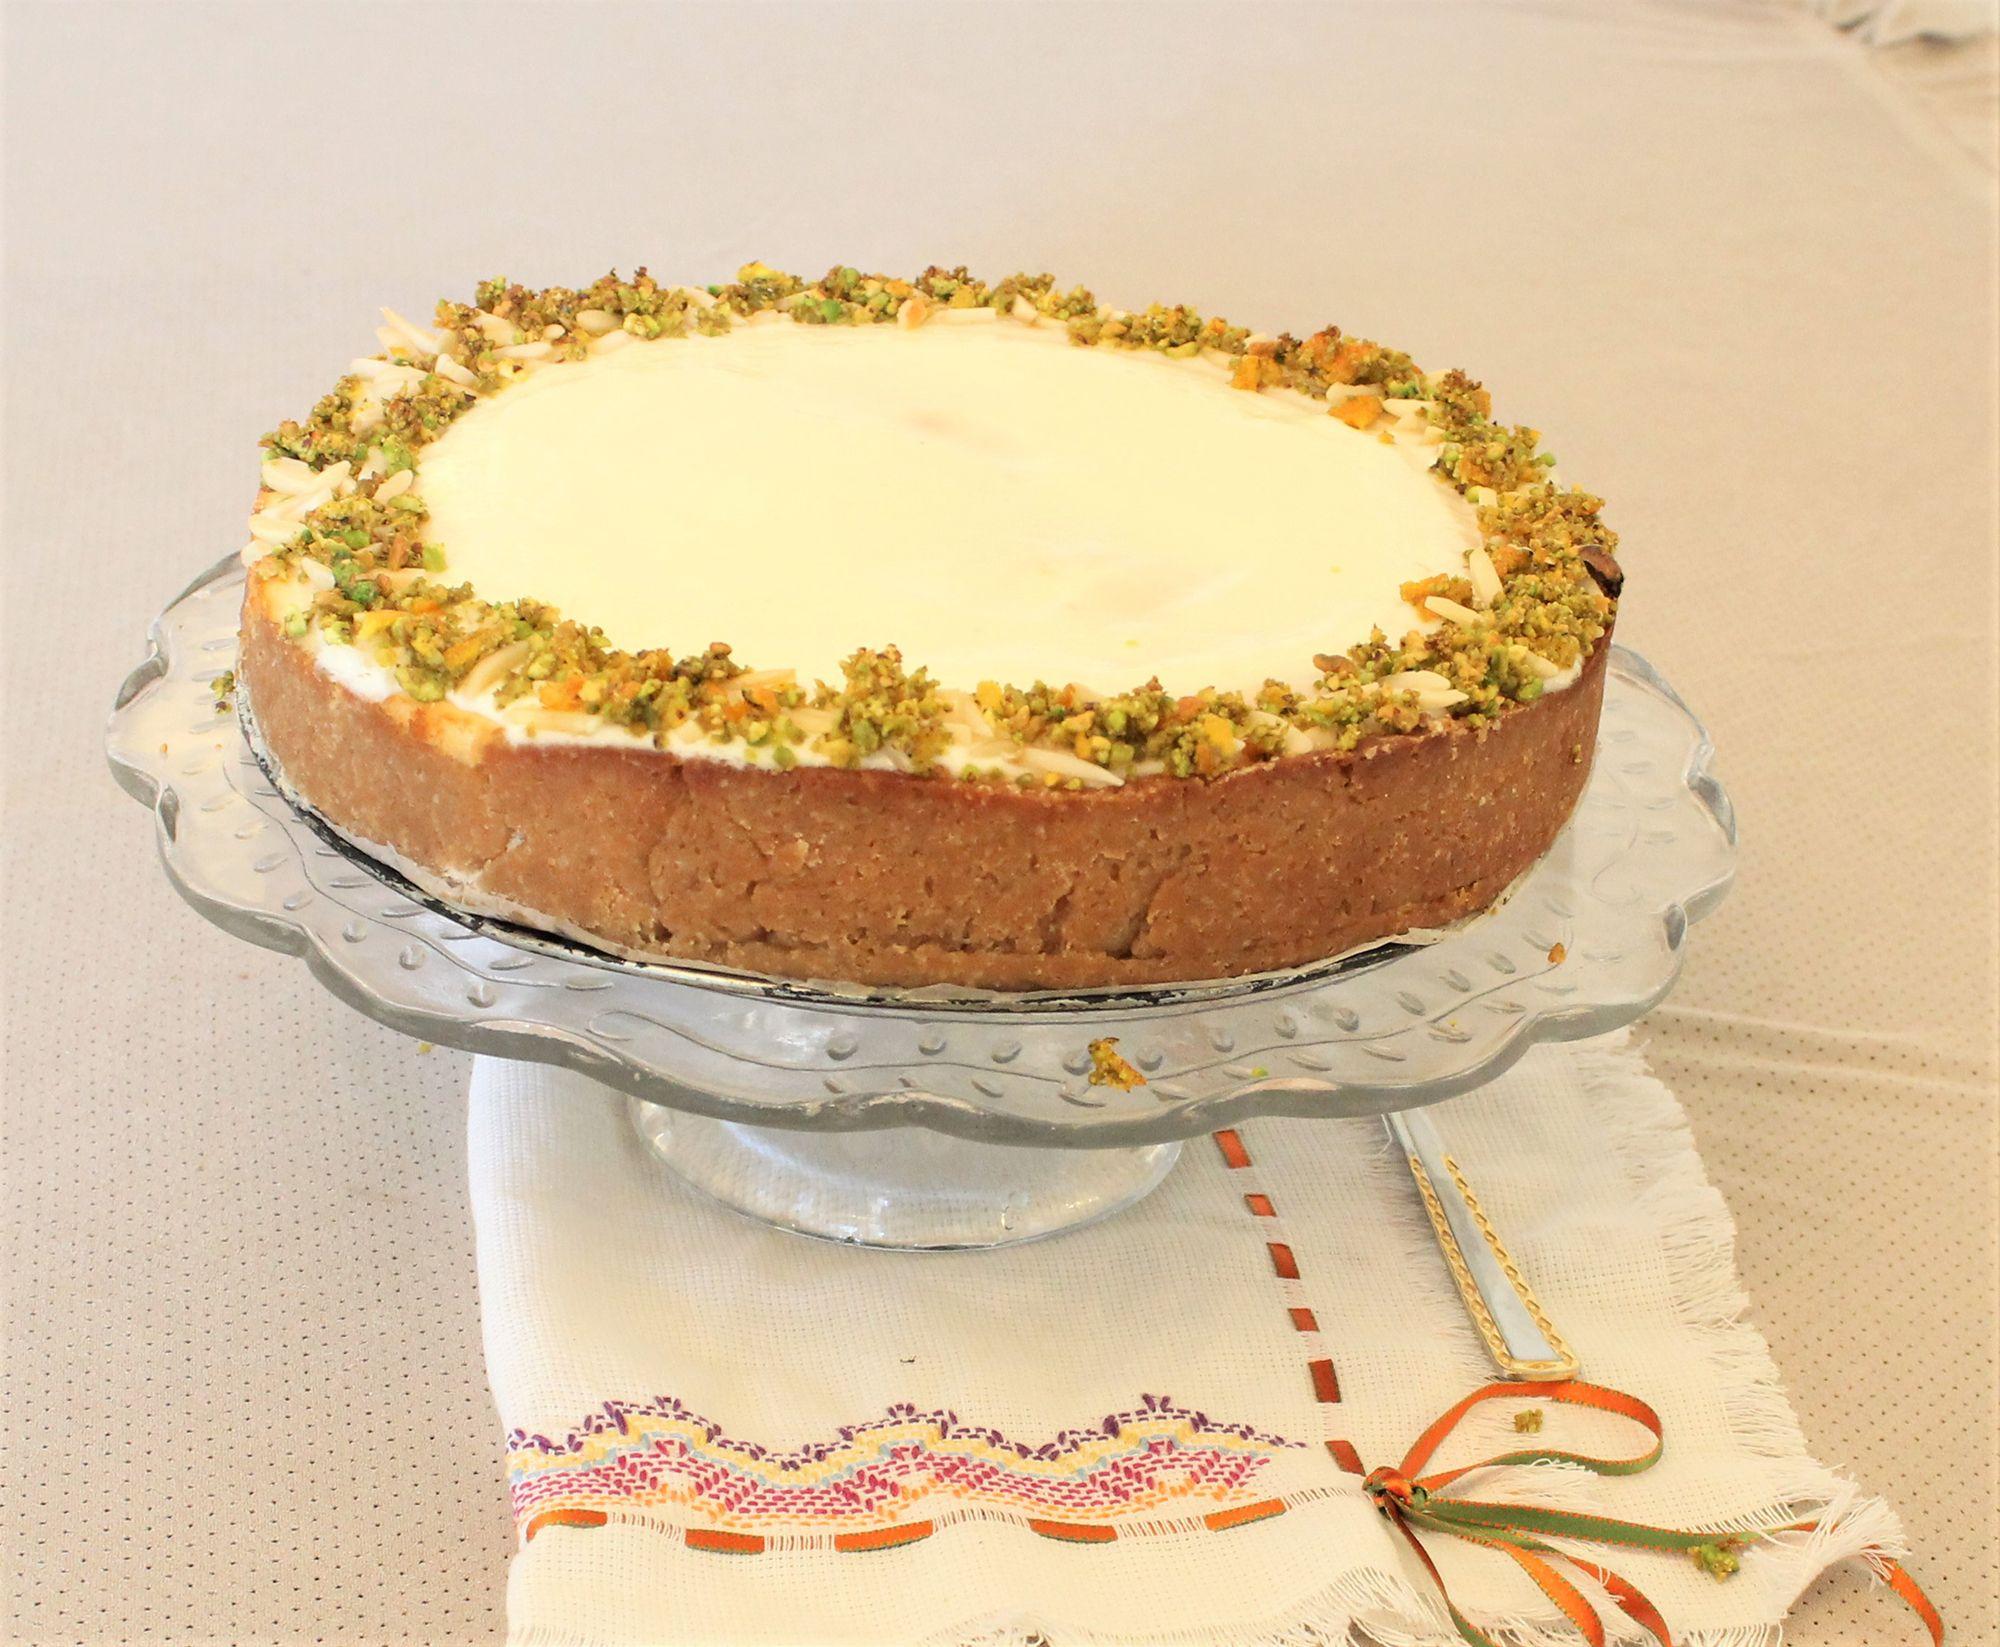 IMG 3774 1 - עוגת גבינה בניחוח פרות הדר